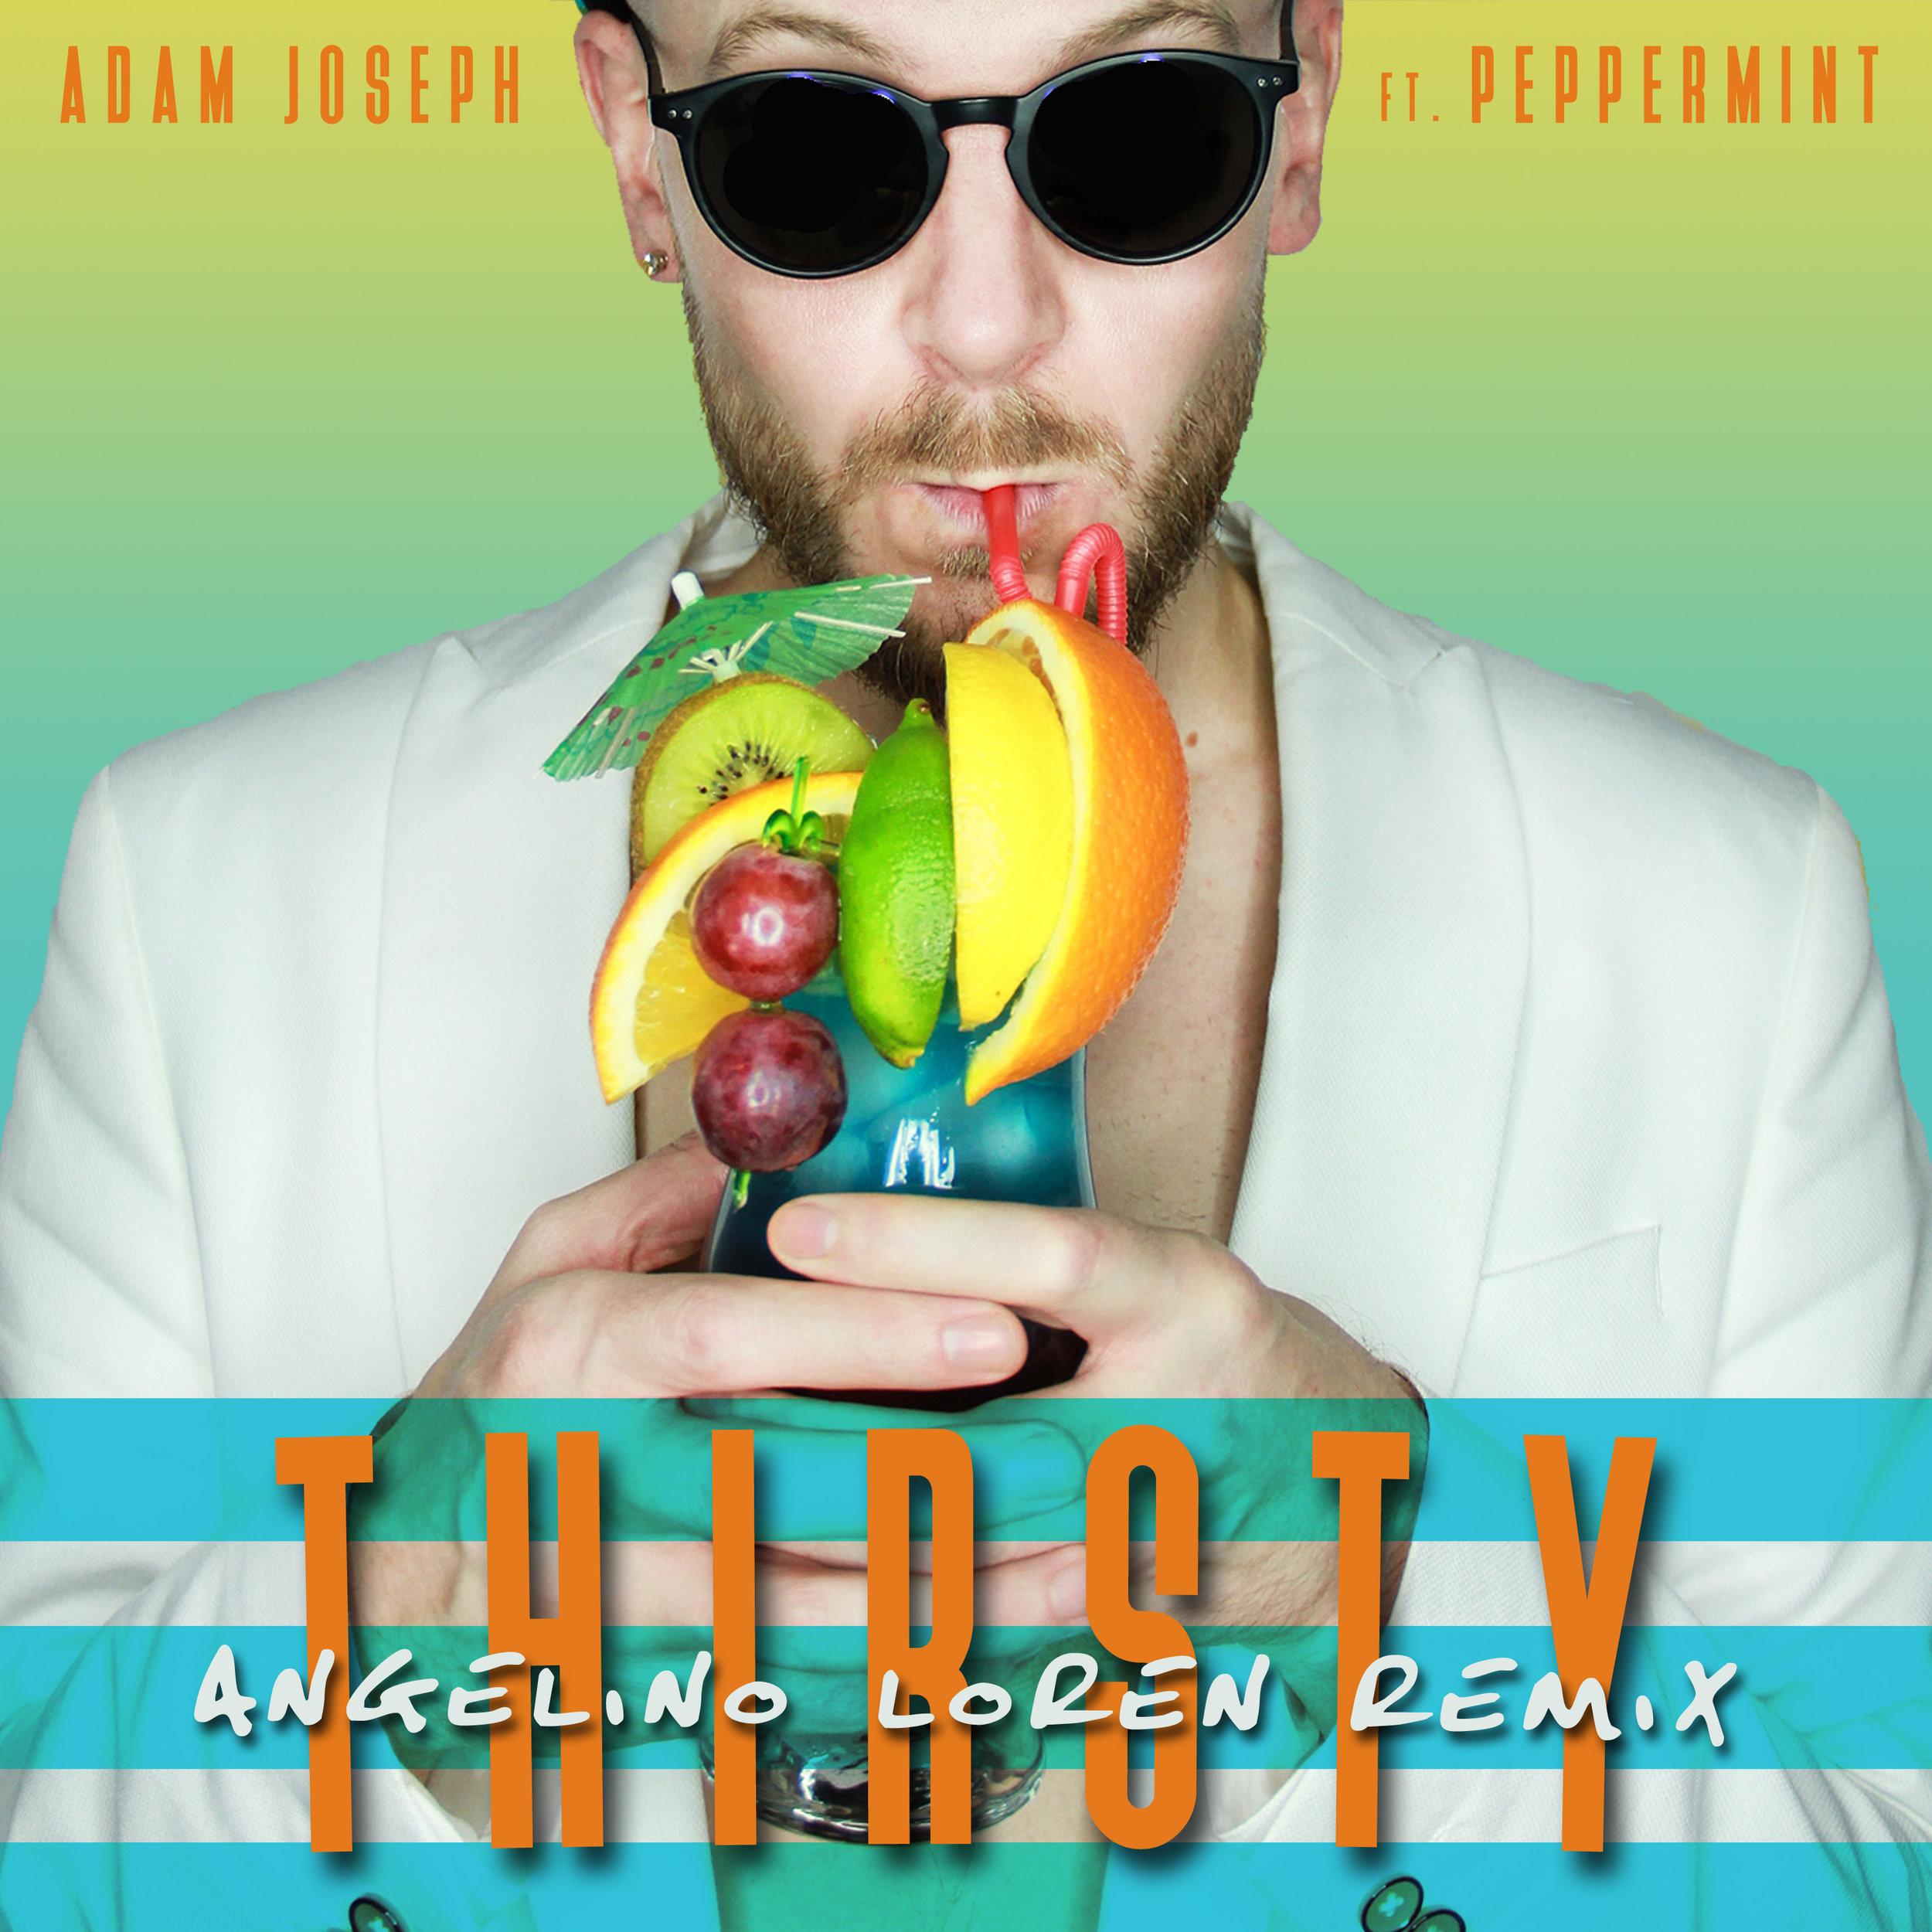 Adam Joseph - Thirsty ft. Peppermint (Angelino Loren Remix)